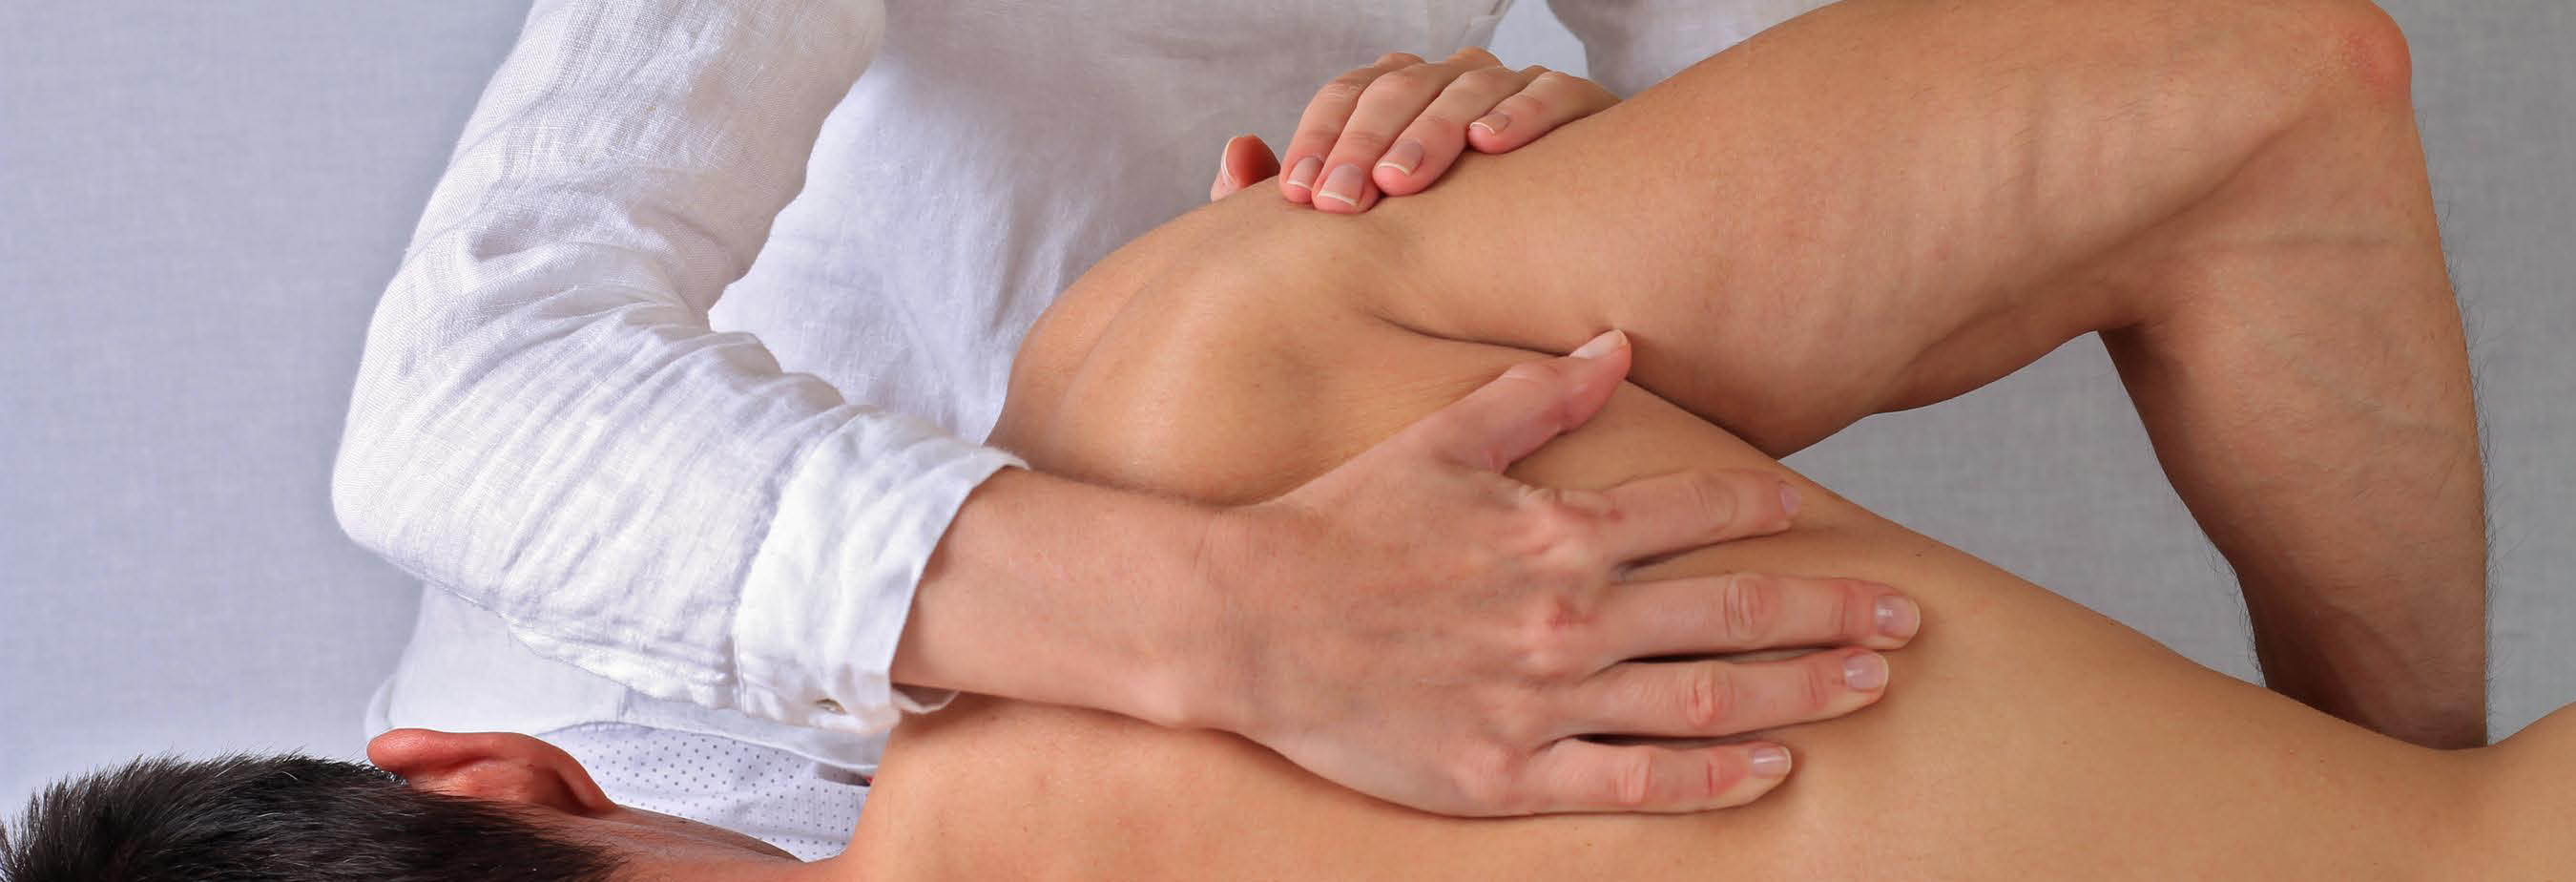 massage envy massage therapy bridgewater falls eastgate cincinnati ohio